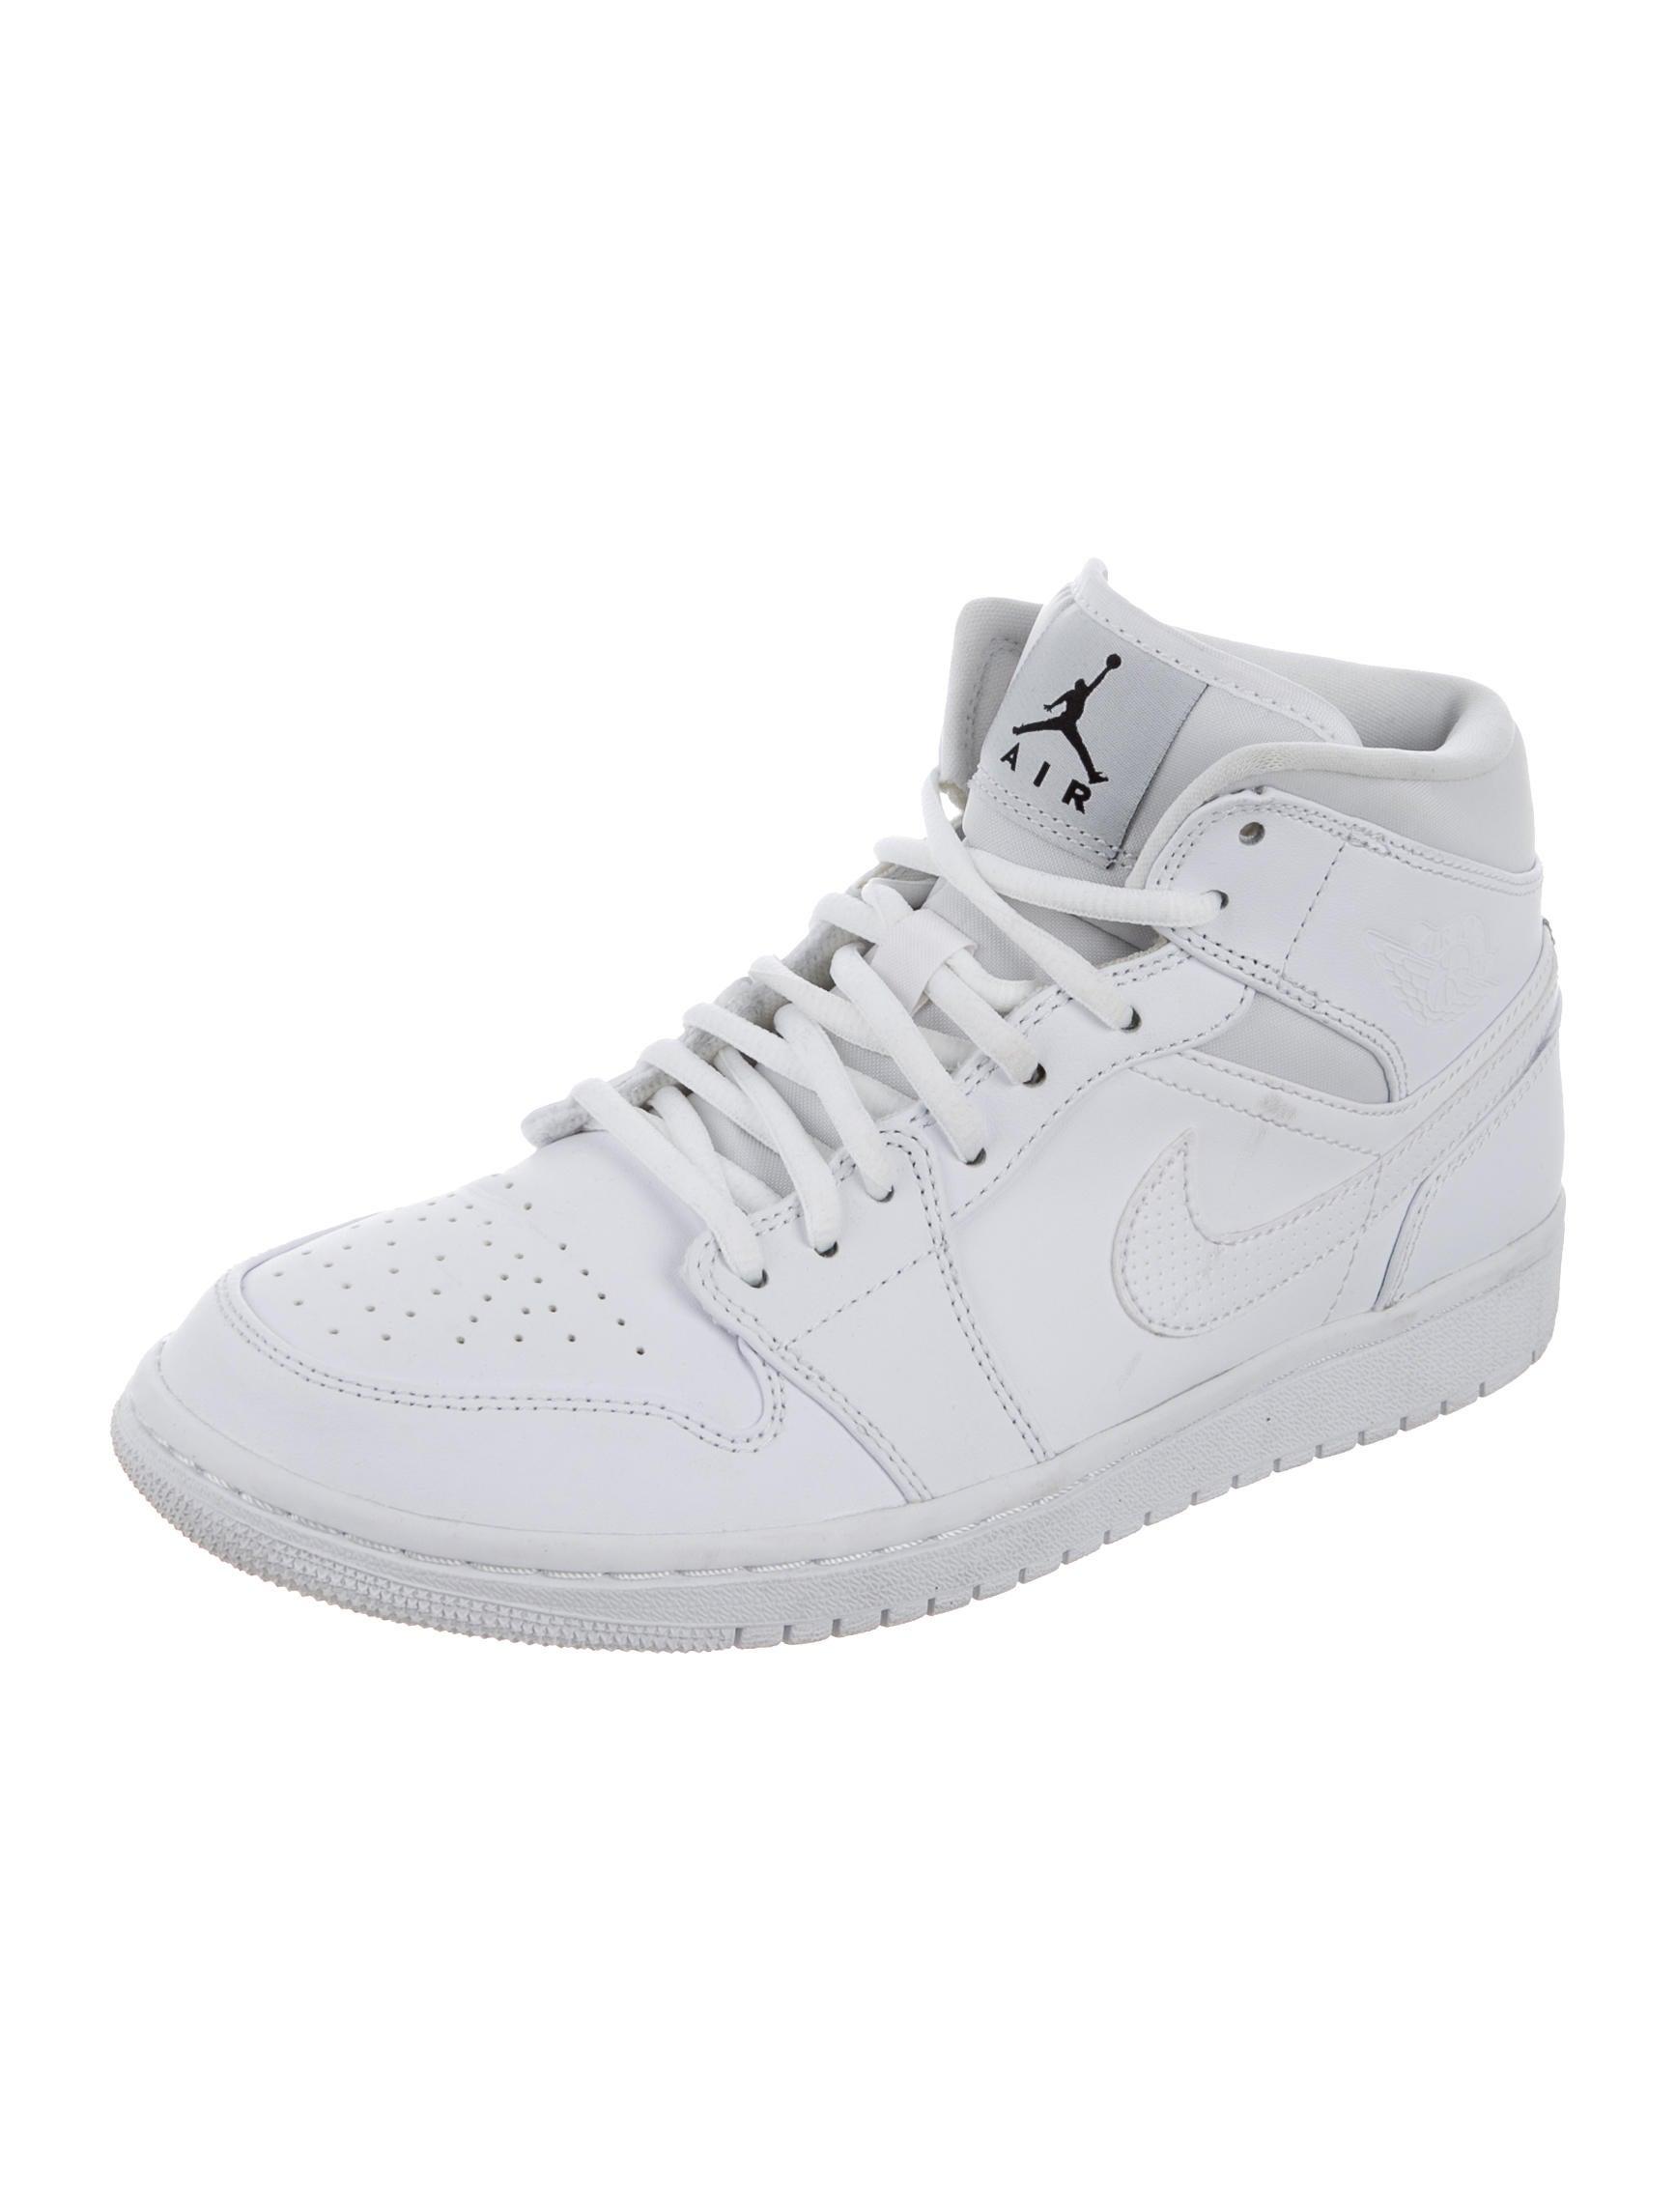 nike air jordan 1 retro mid sneakers shoes wu220878. Black Bedroom Furniture Sets. Home Design Ideas